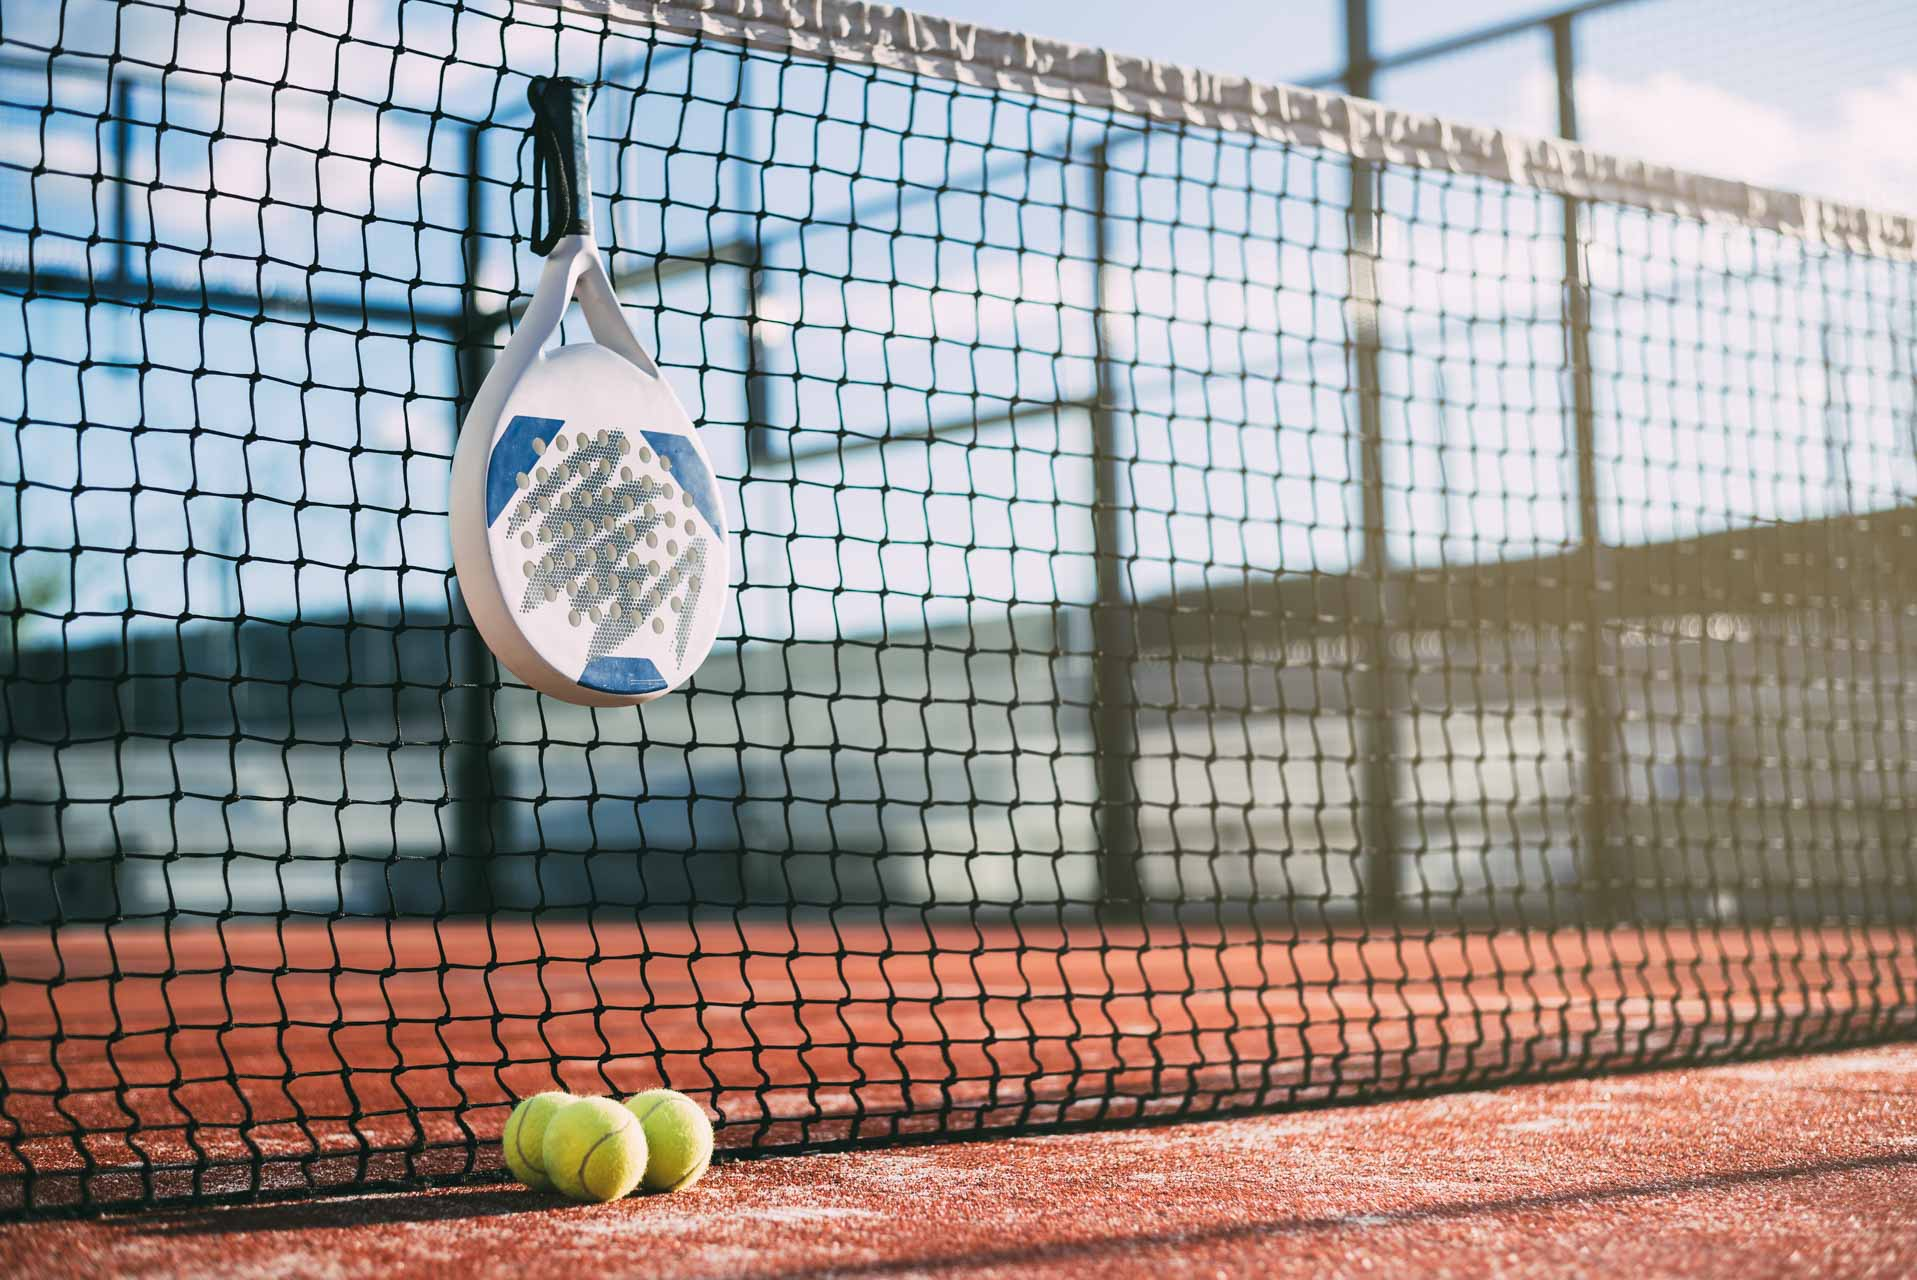 Padel blade racket hanging on the net